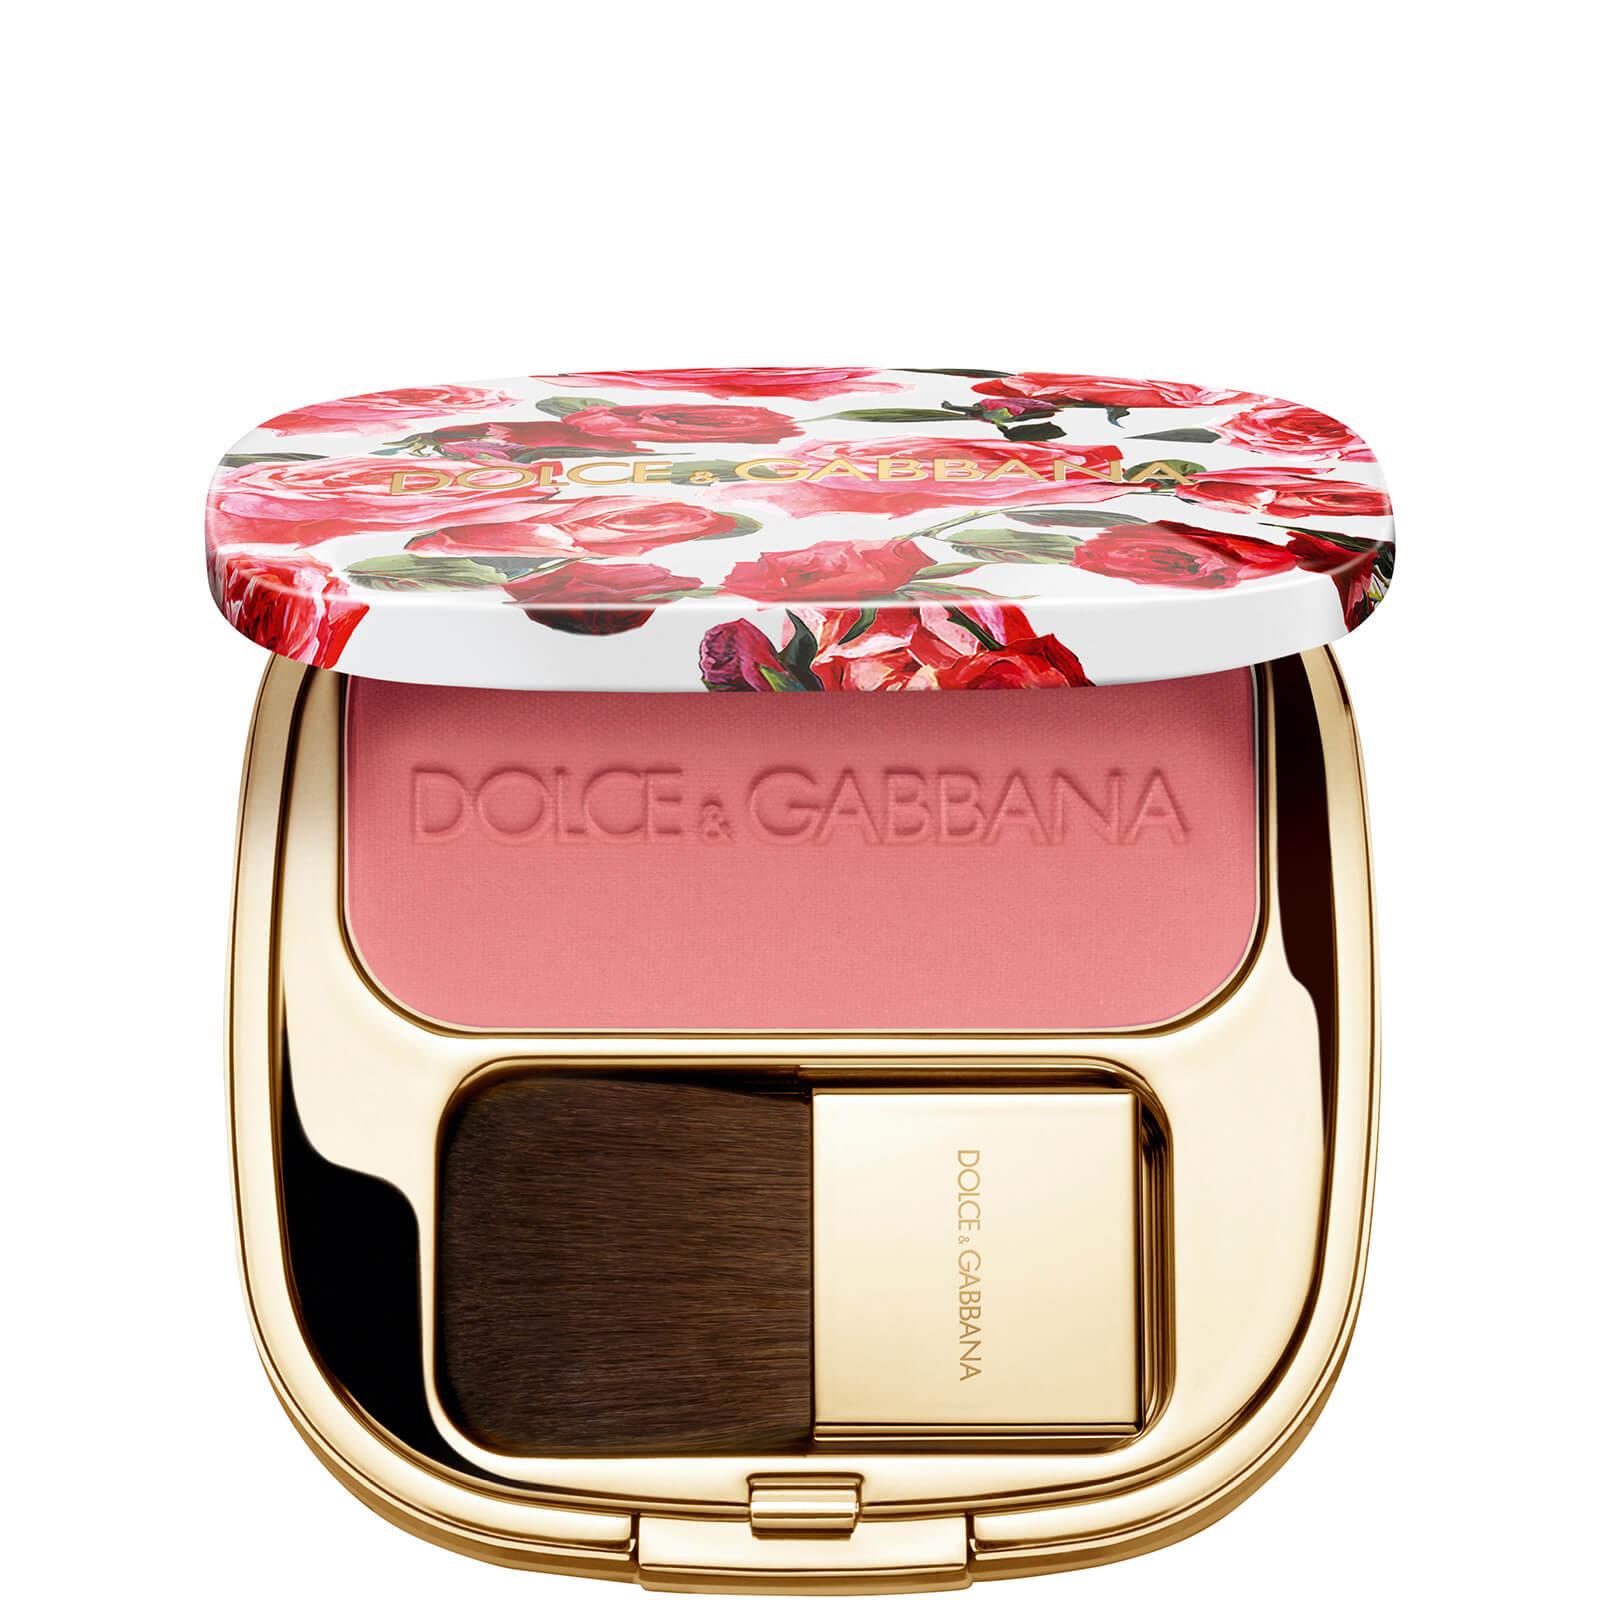 Купить Dolce&Gabbana Blush of Roses Luminous Cheek Colour 5g (Various Shades) - 410 Delight